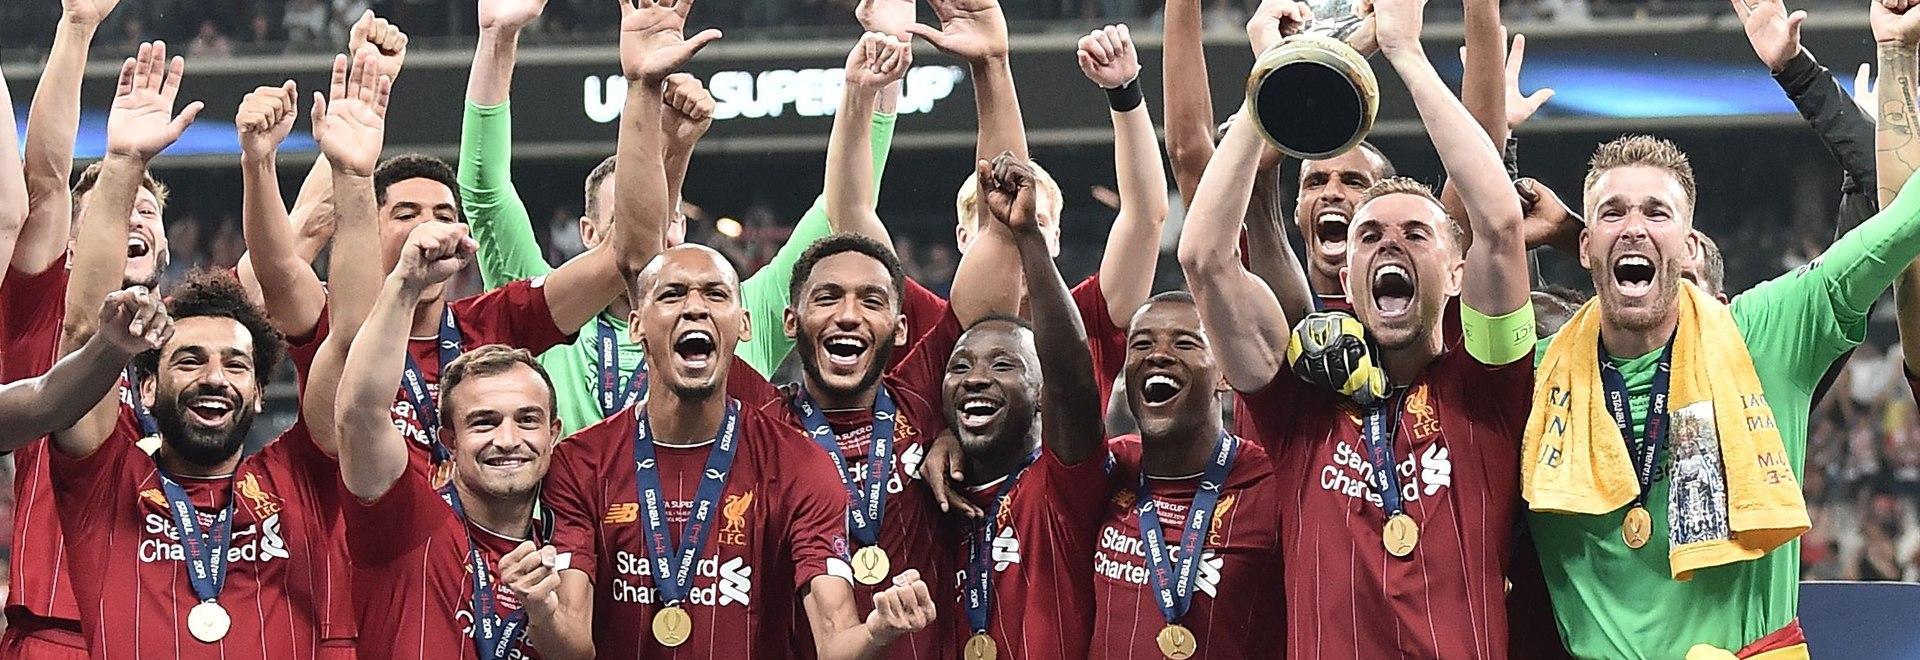 History Remix Champions - Le Finali - Ep. 0 - History Remix Champions - Le Finali